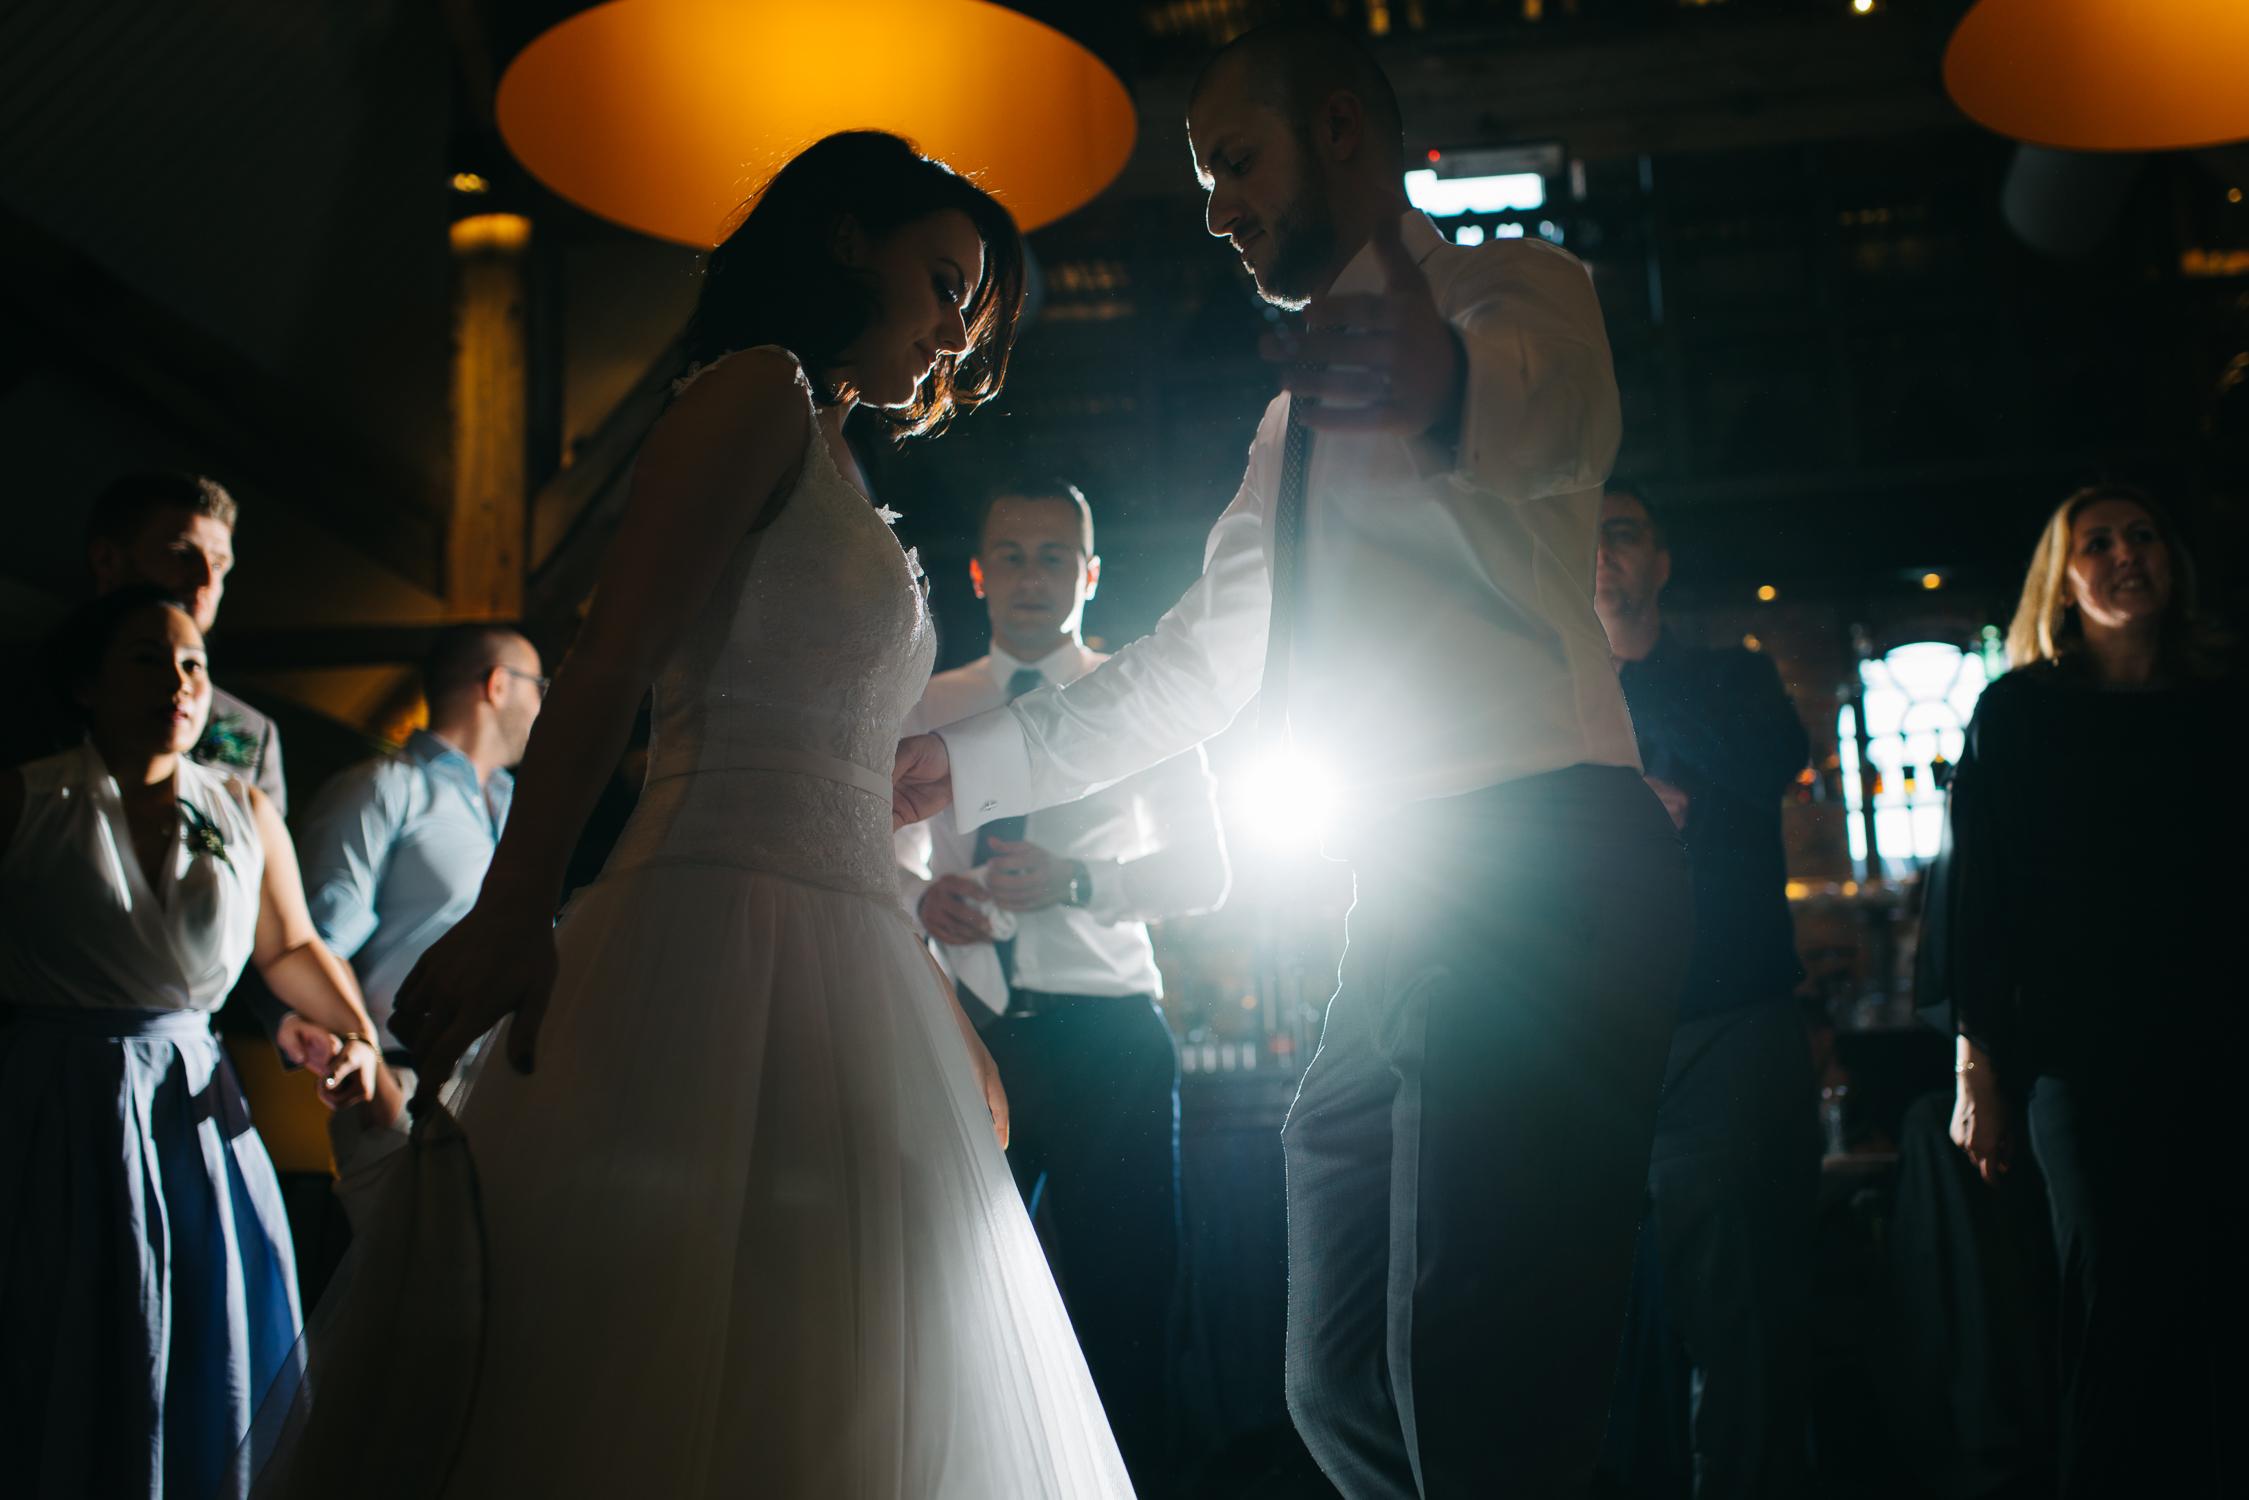 bruidsfotografie-bruidsfotograaf-mark-hadden-amsterdam-rotterdam-utrecht-wedding-photographer-Dado-Delila-464.jpg